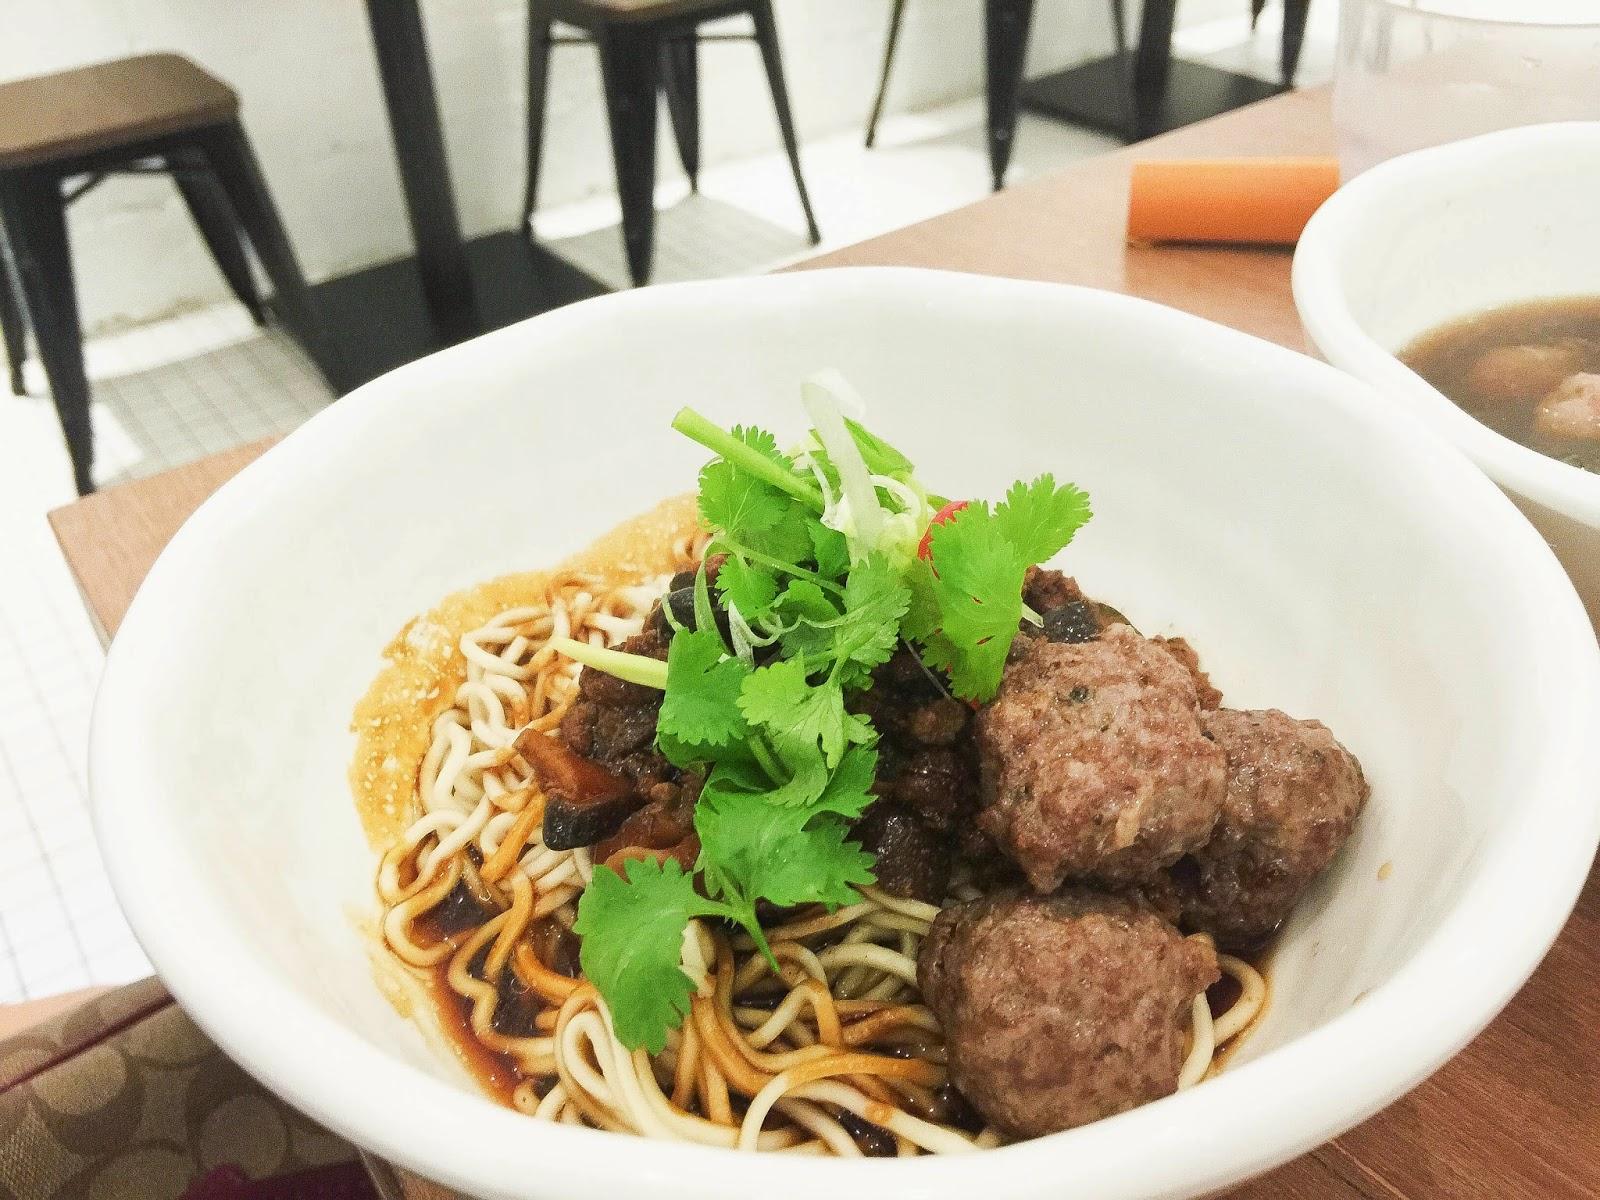 GRUB Noodle Bar Beef Noodles